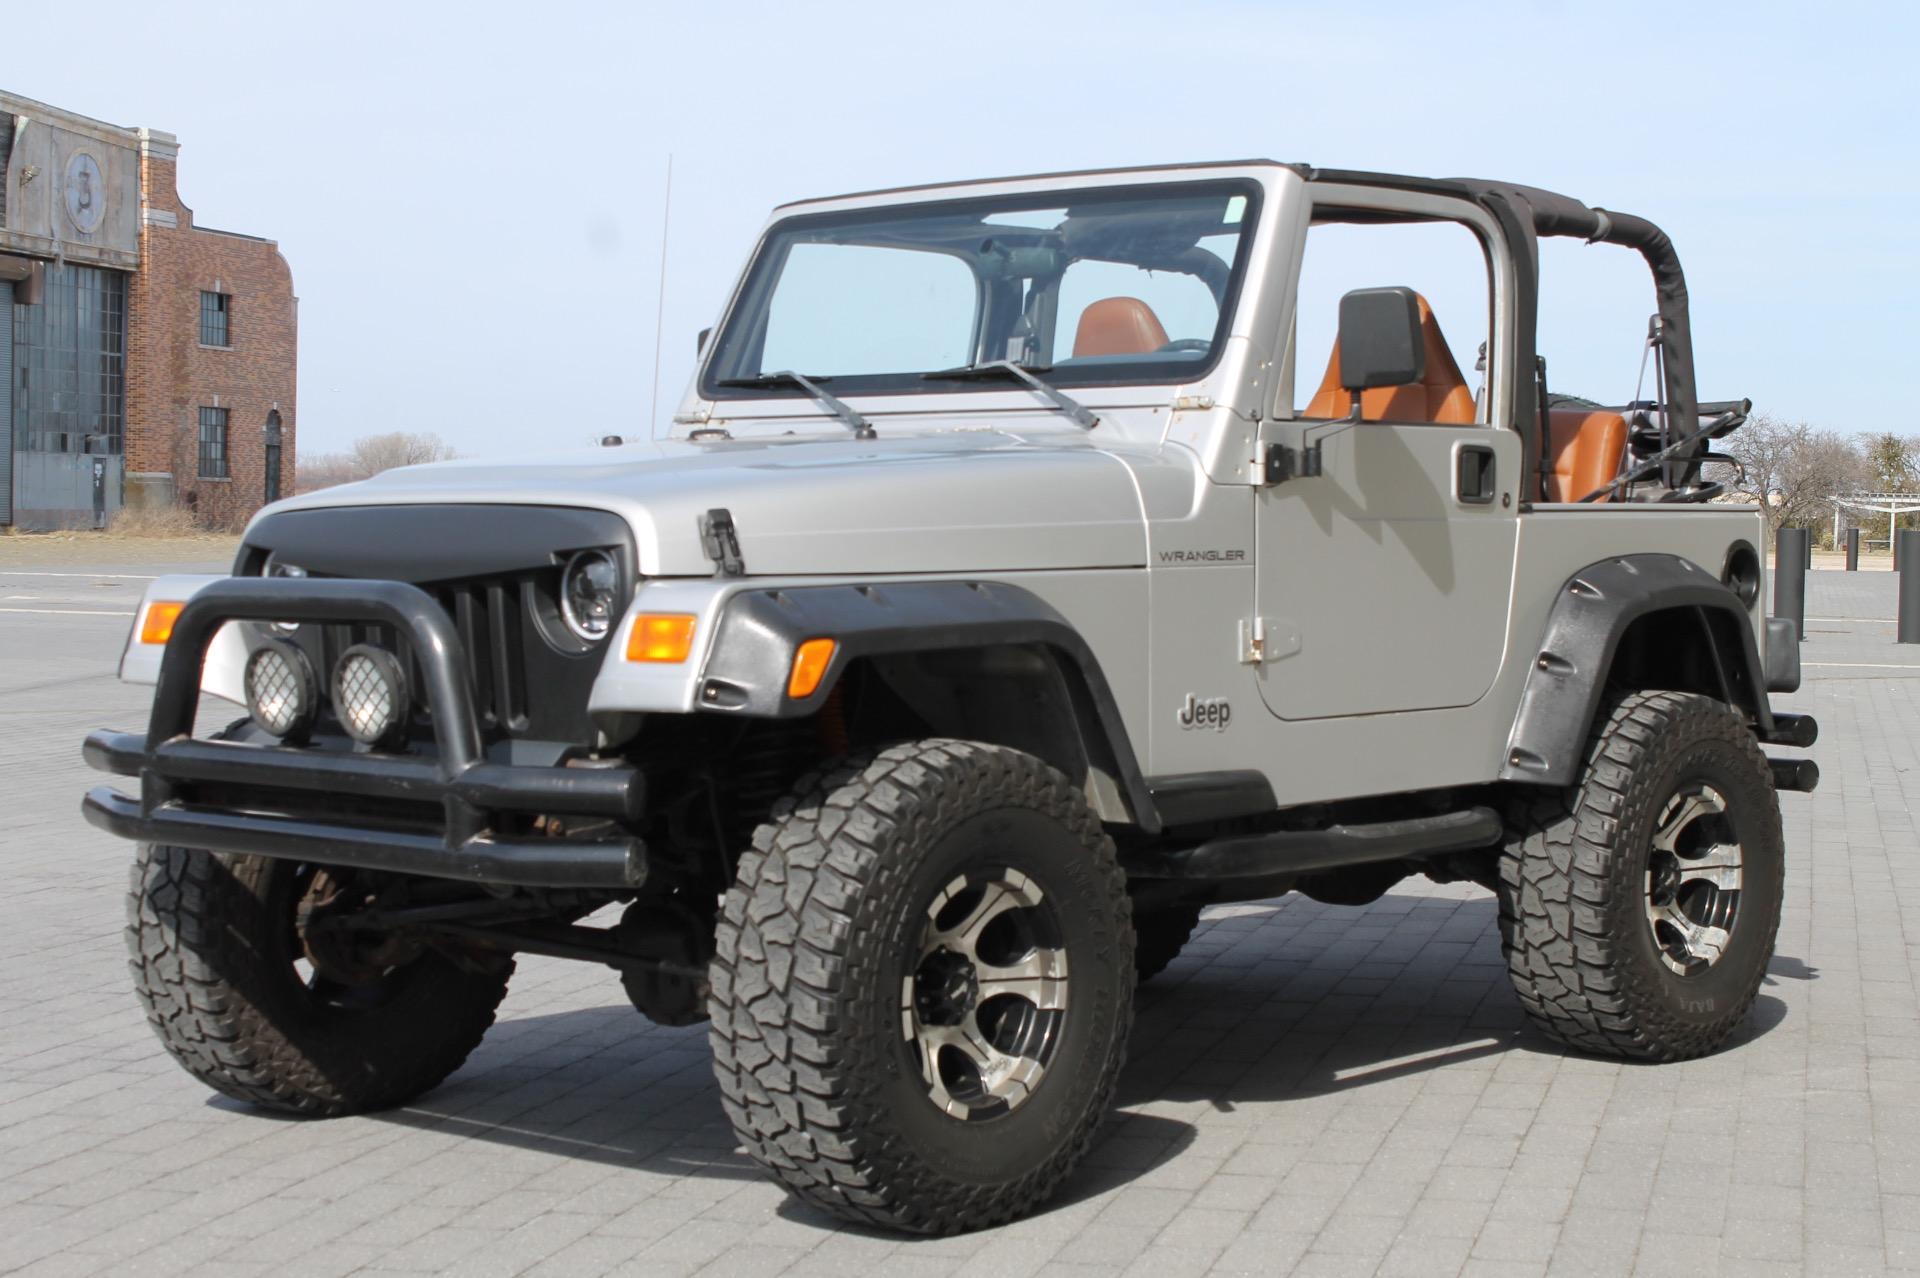 Used-2002-Jeep-Wrangler-Apex-Apex-edition